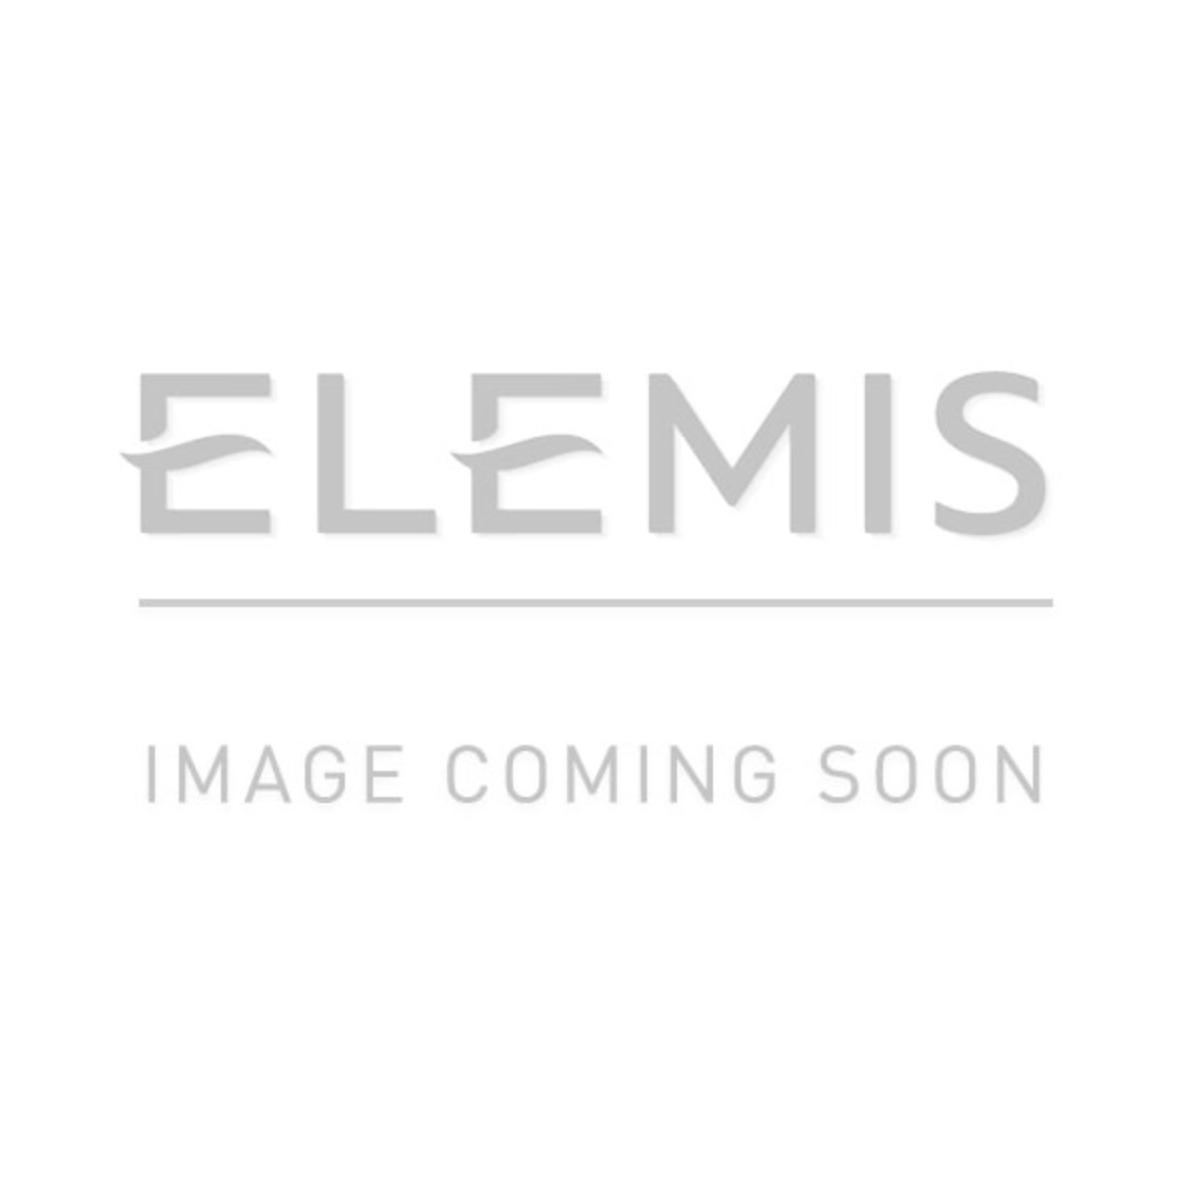 Elemis Revitalise Me Shower Gel 200ml Elemis